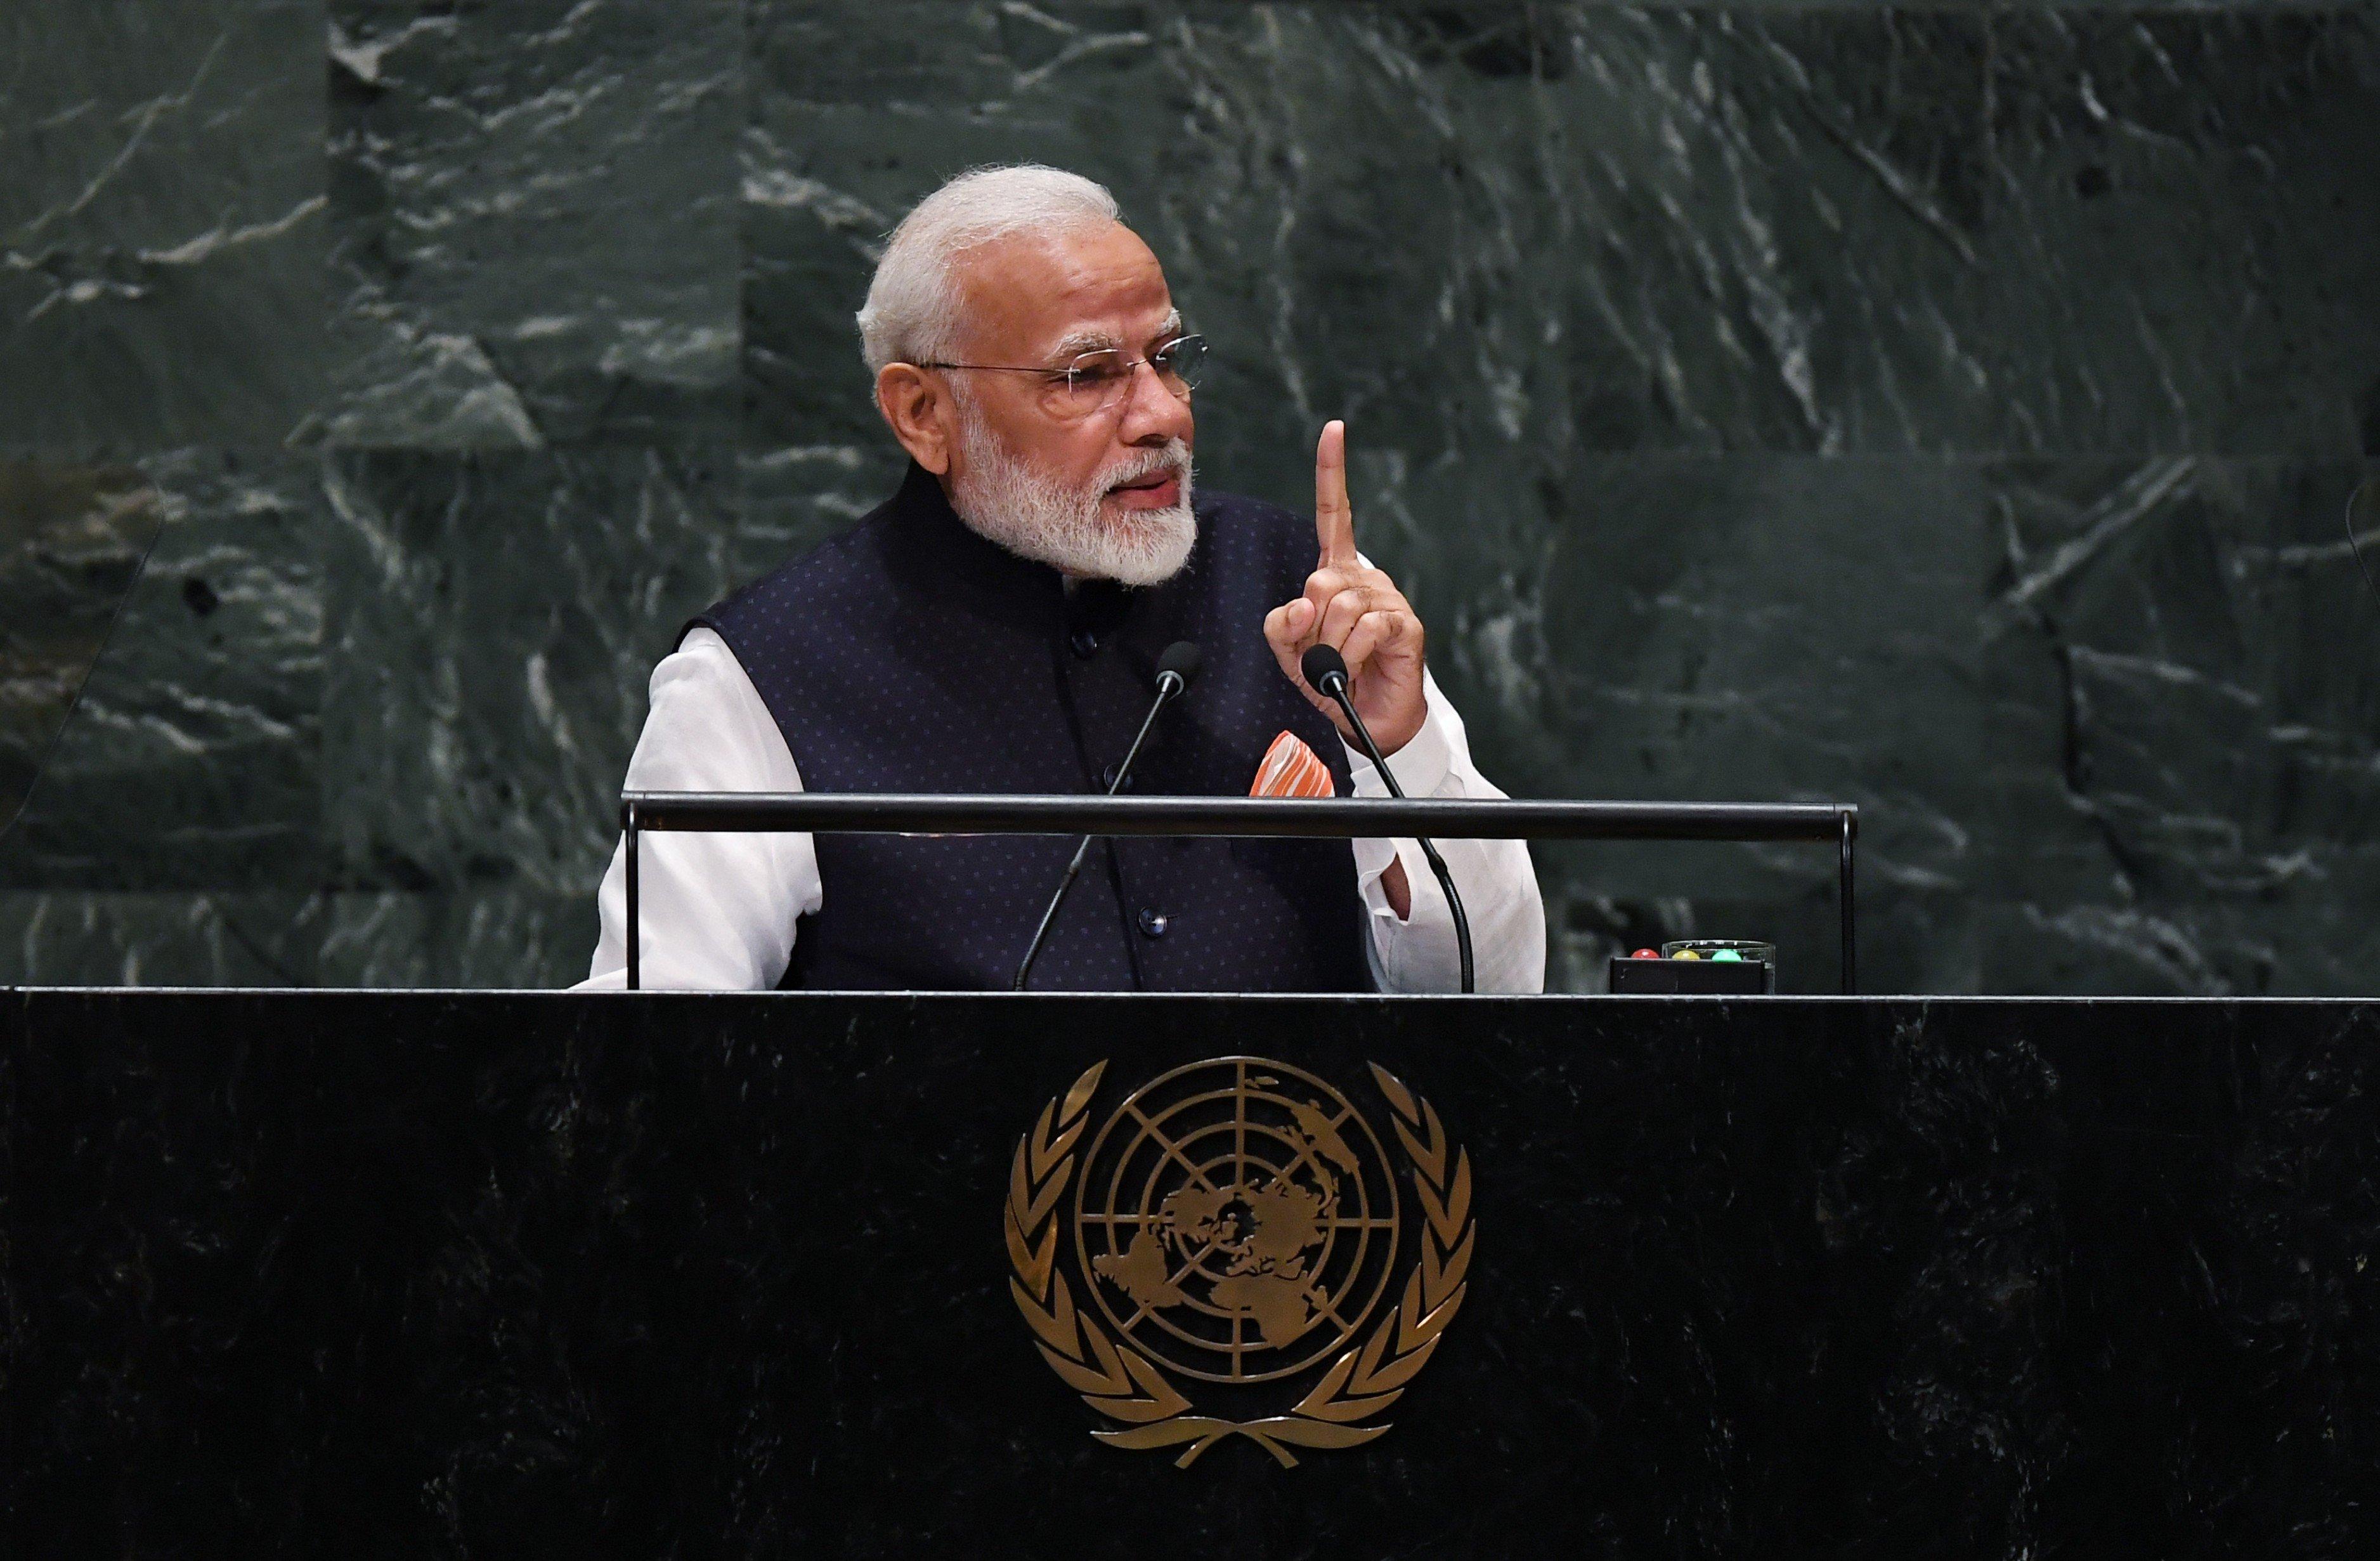 Prime Minister Narendra Modi addressing the UN General Assembly. Photo courtesy: Twitter/@PIB_India